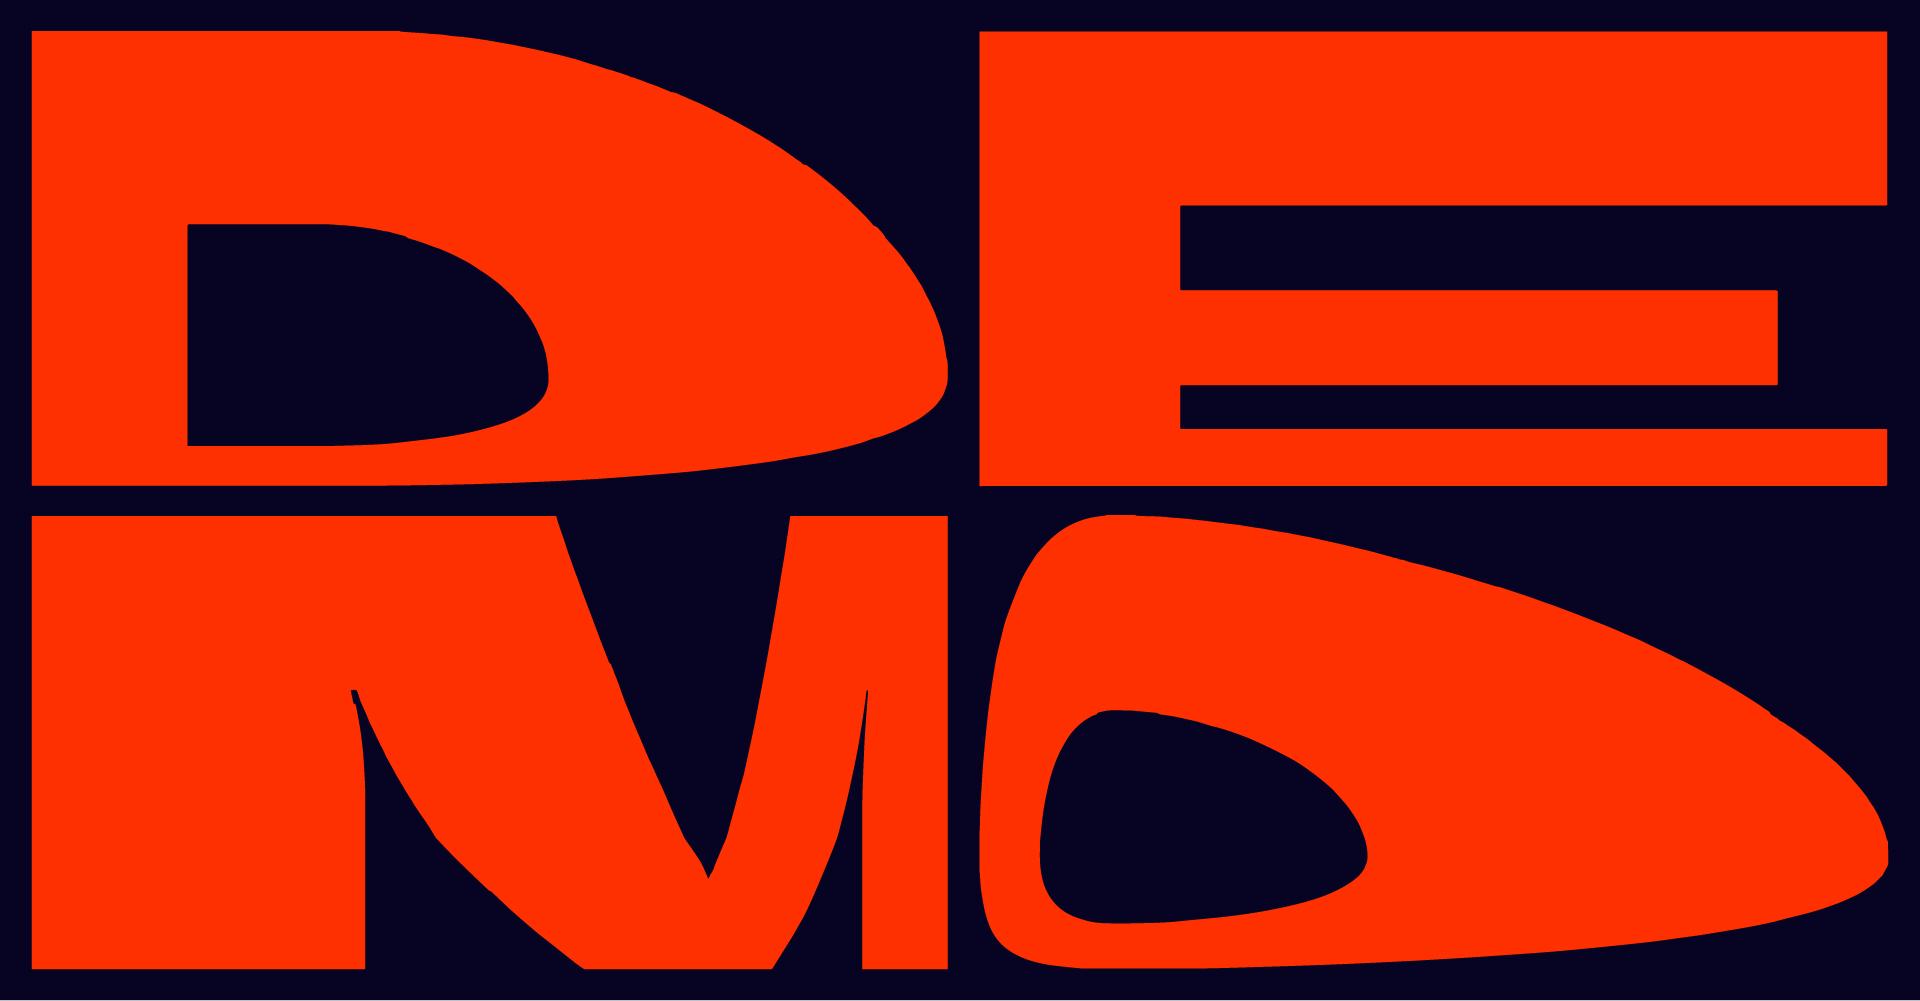 demo-festival-media-partnership-hub-page-hero.jpg